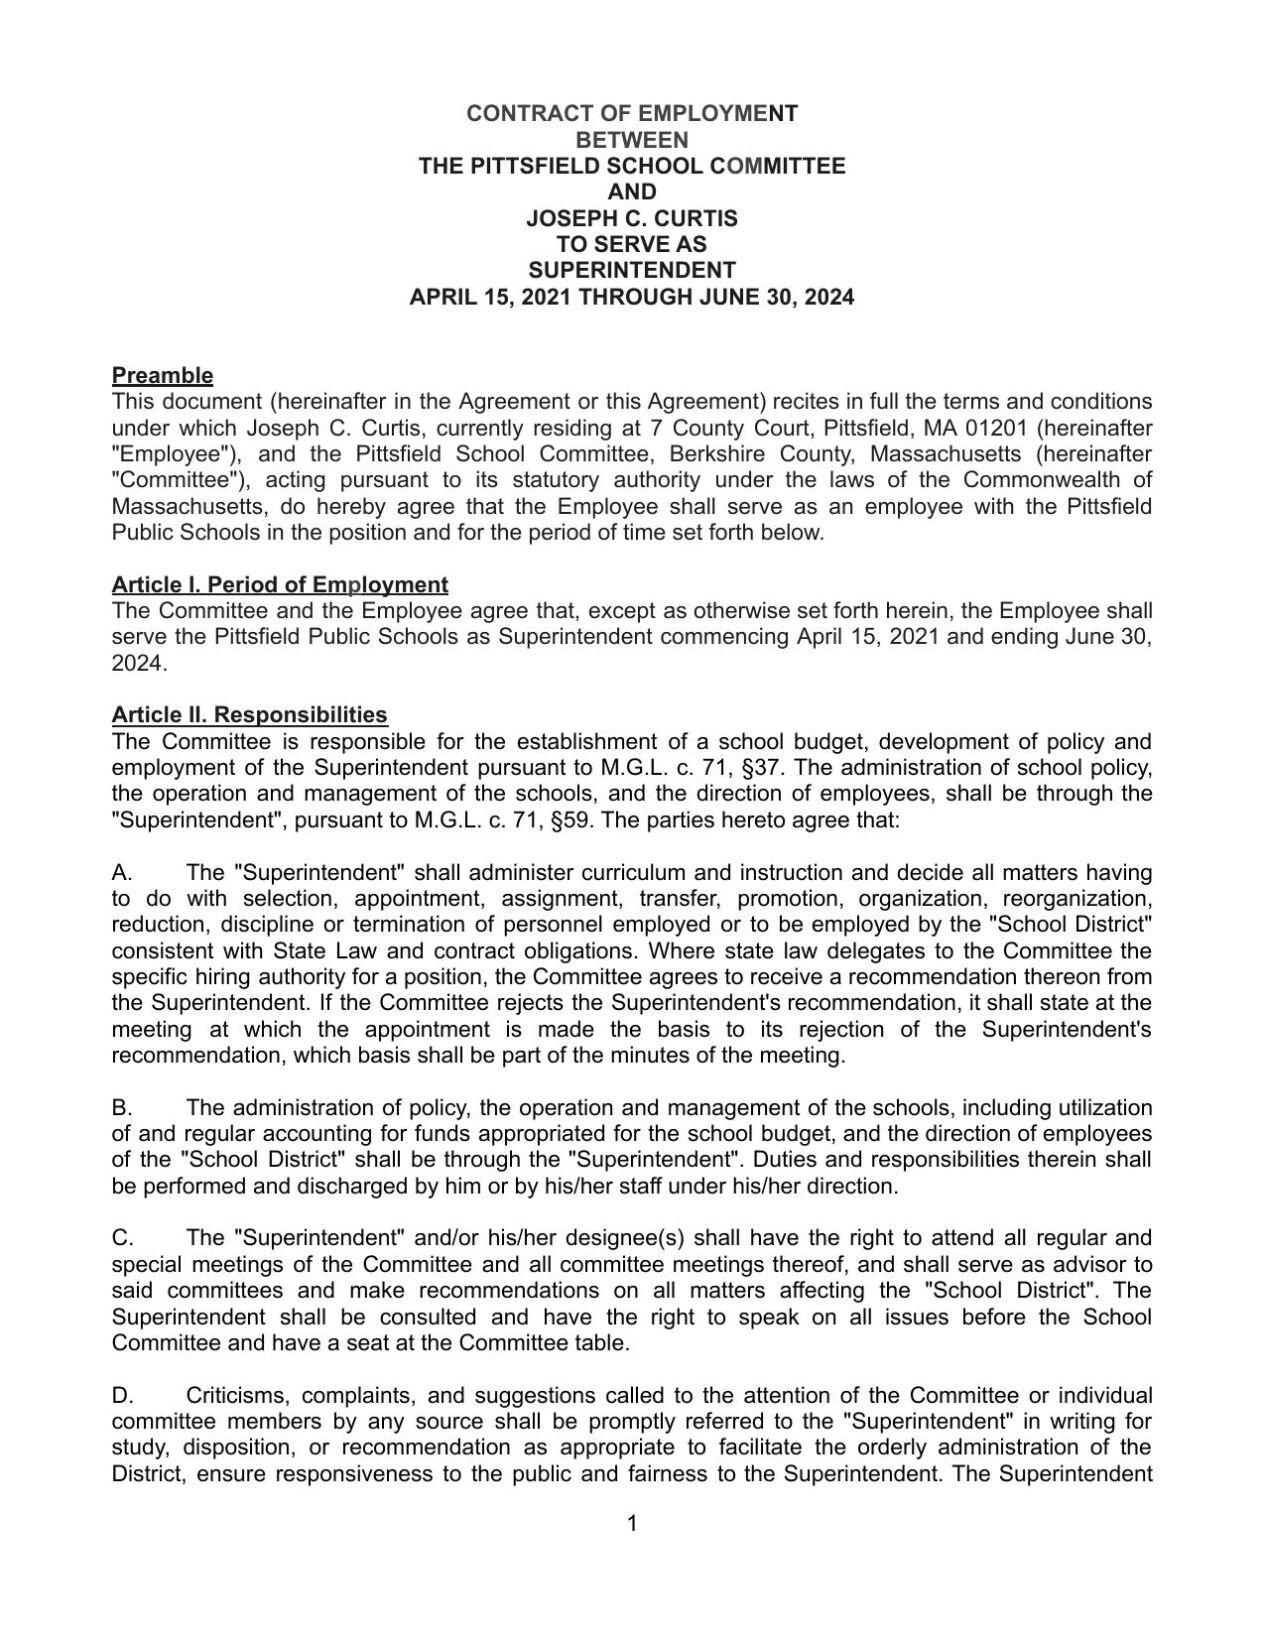 Joseph Curtis employment contract